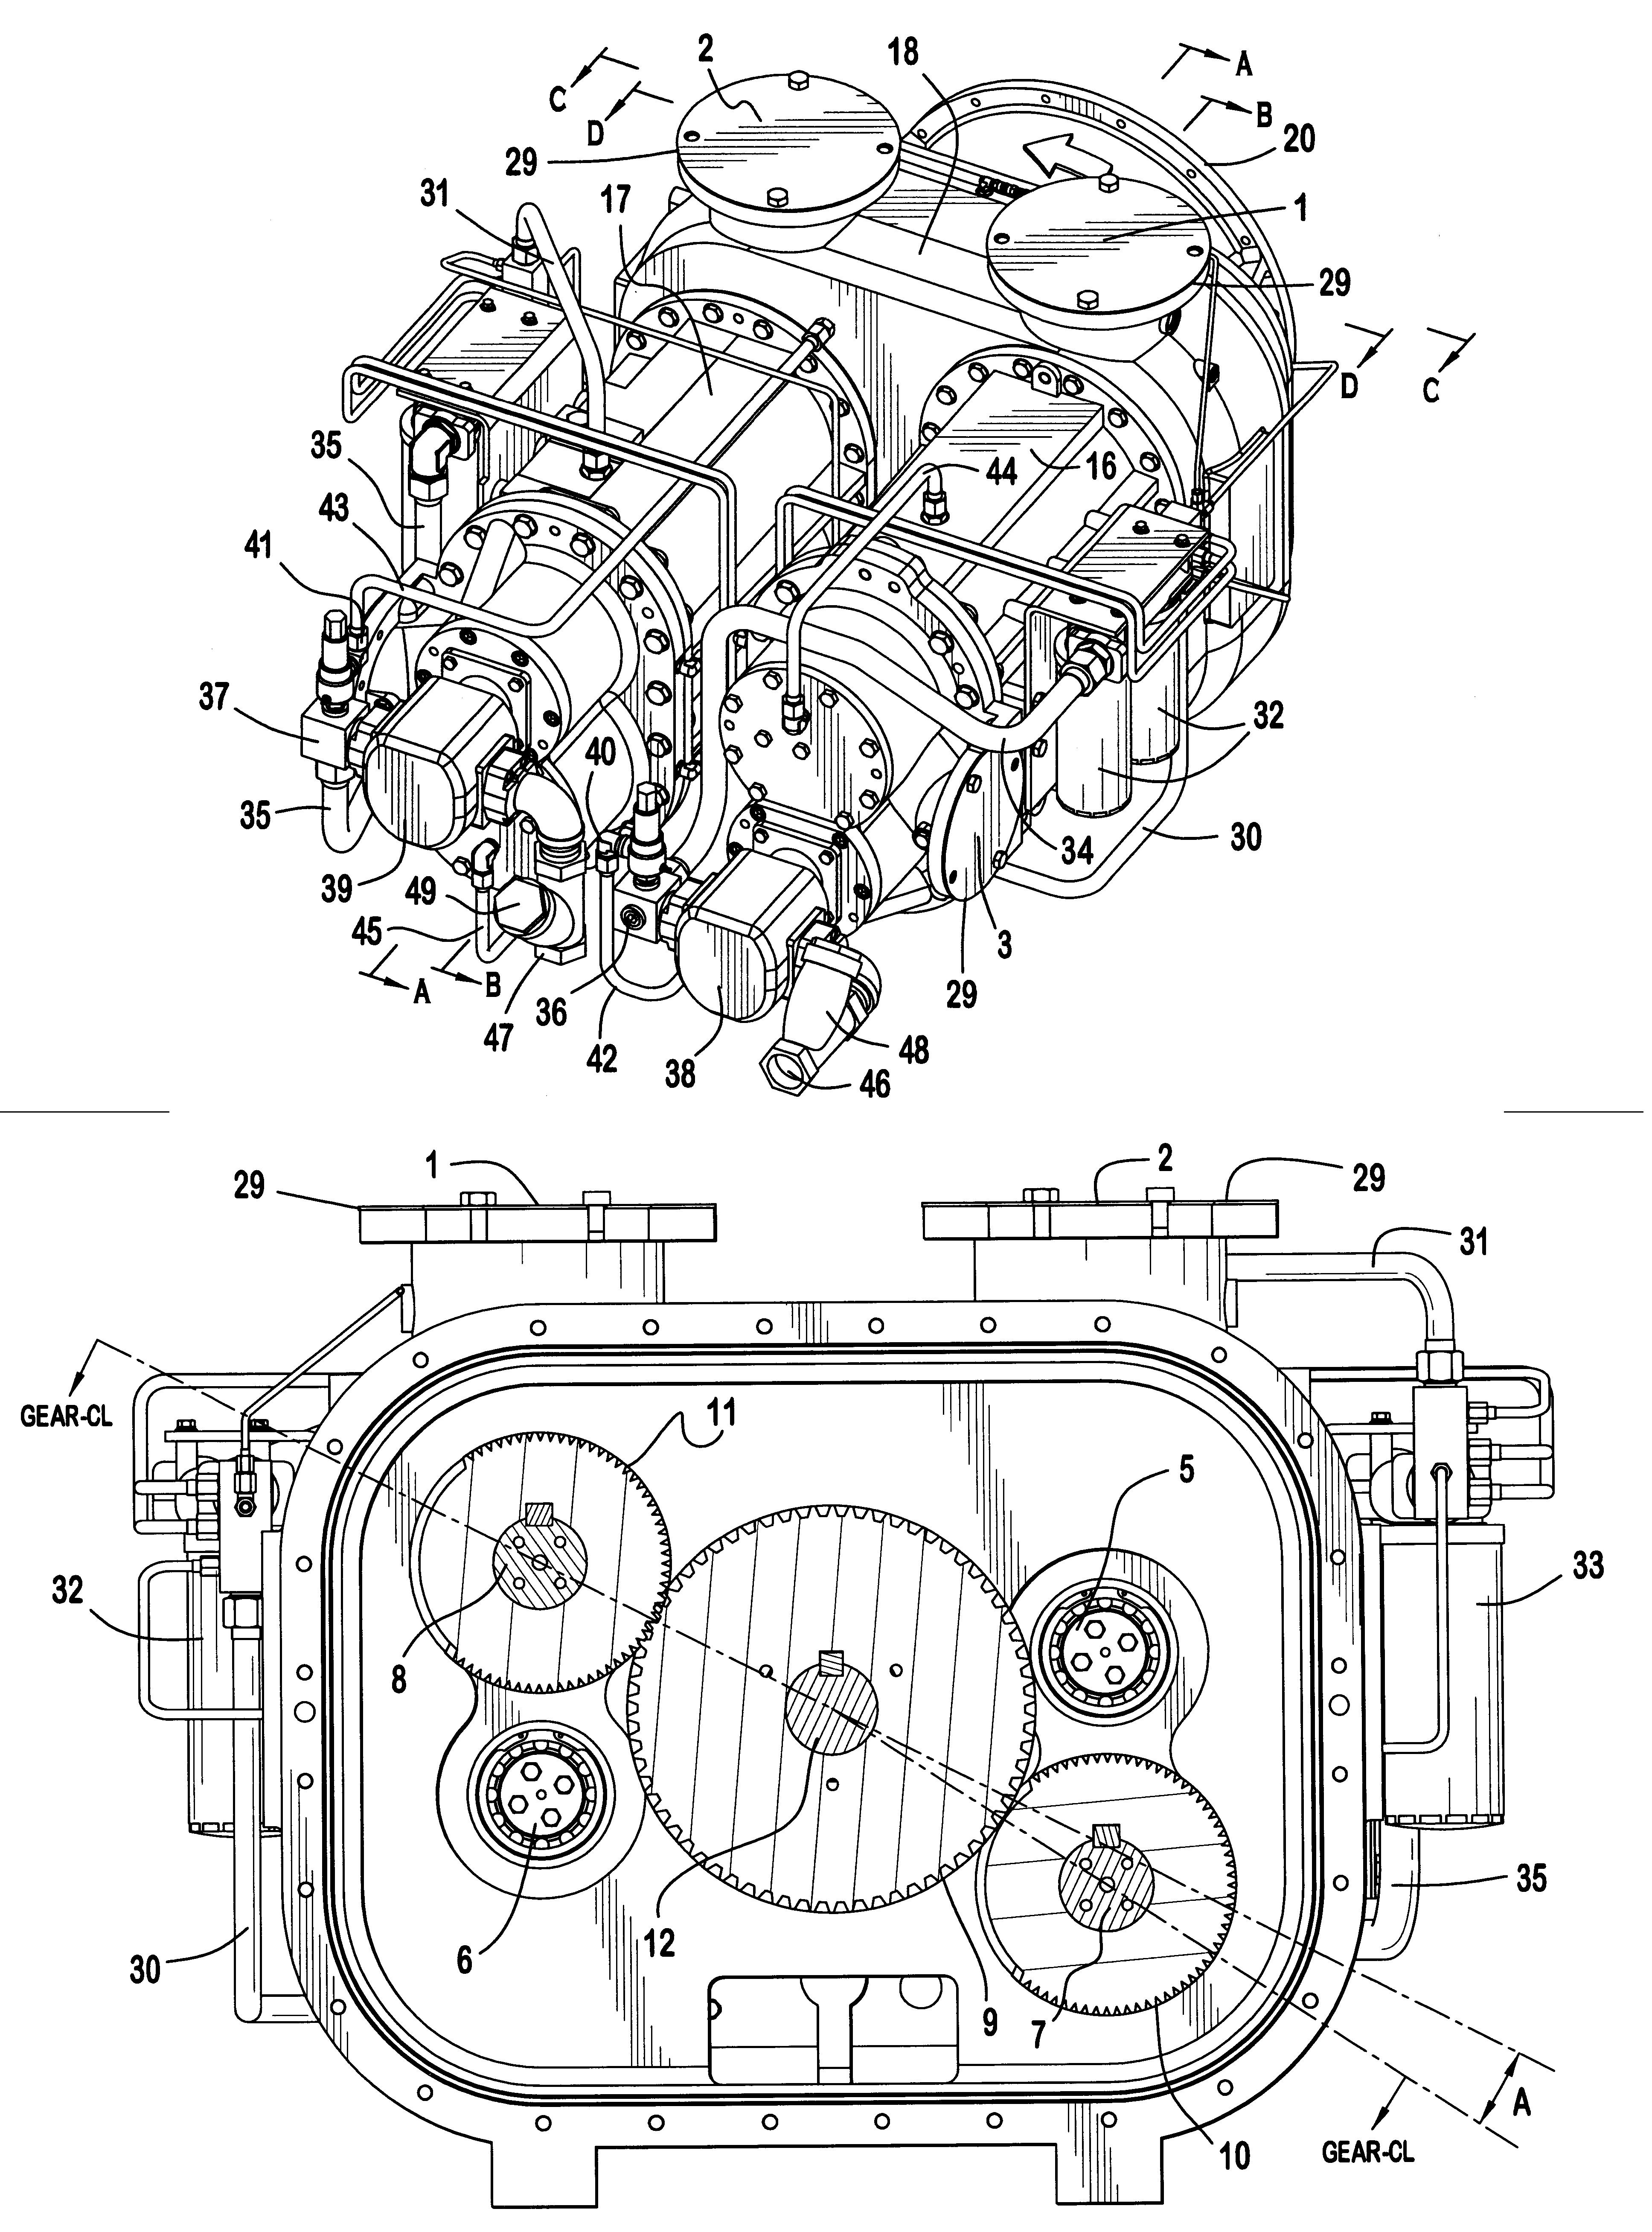 compressor drawing